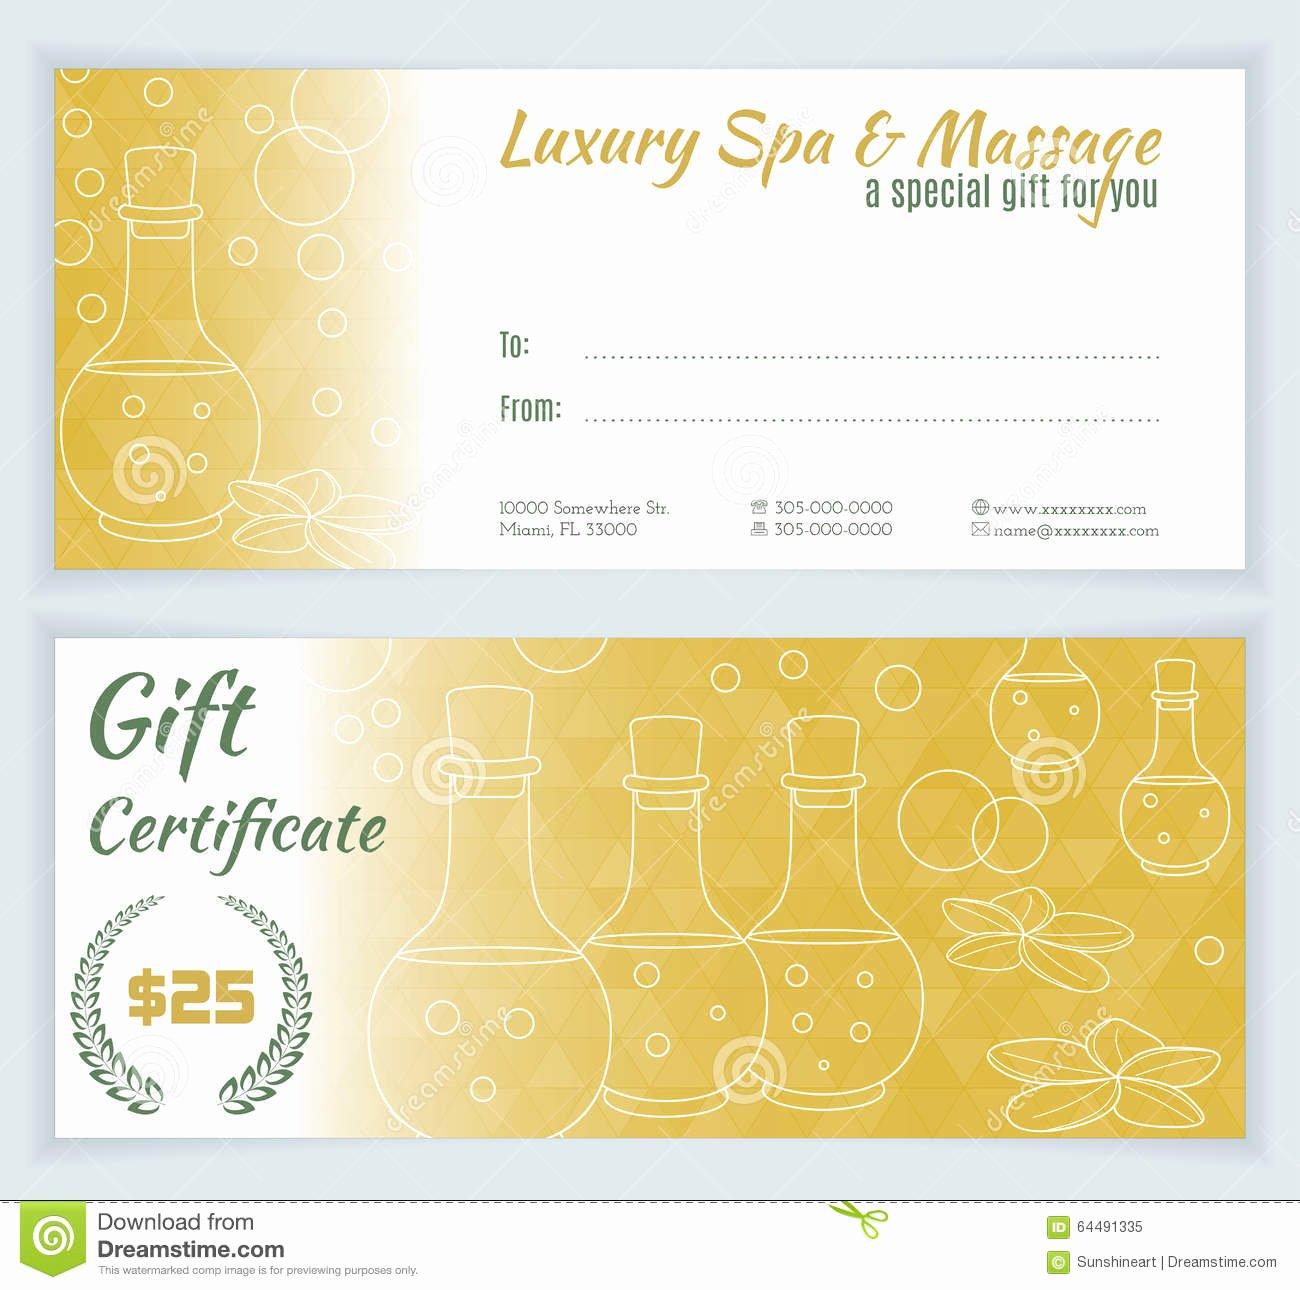 Massage Gift Certificate Template Inspirational Spa Massage Gift Certificate Template Stock Illustration